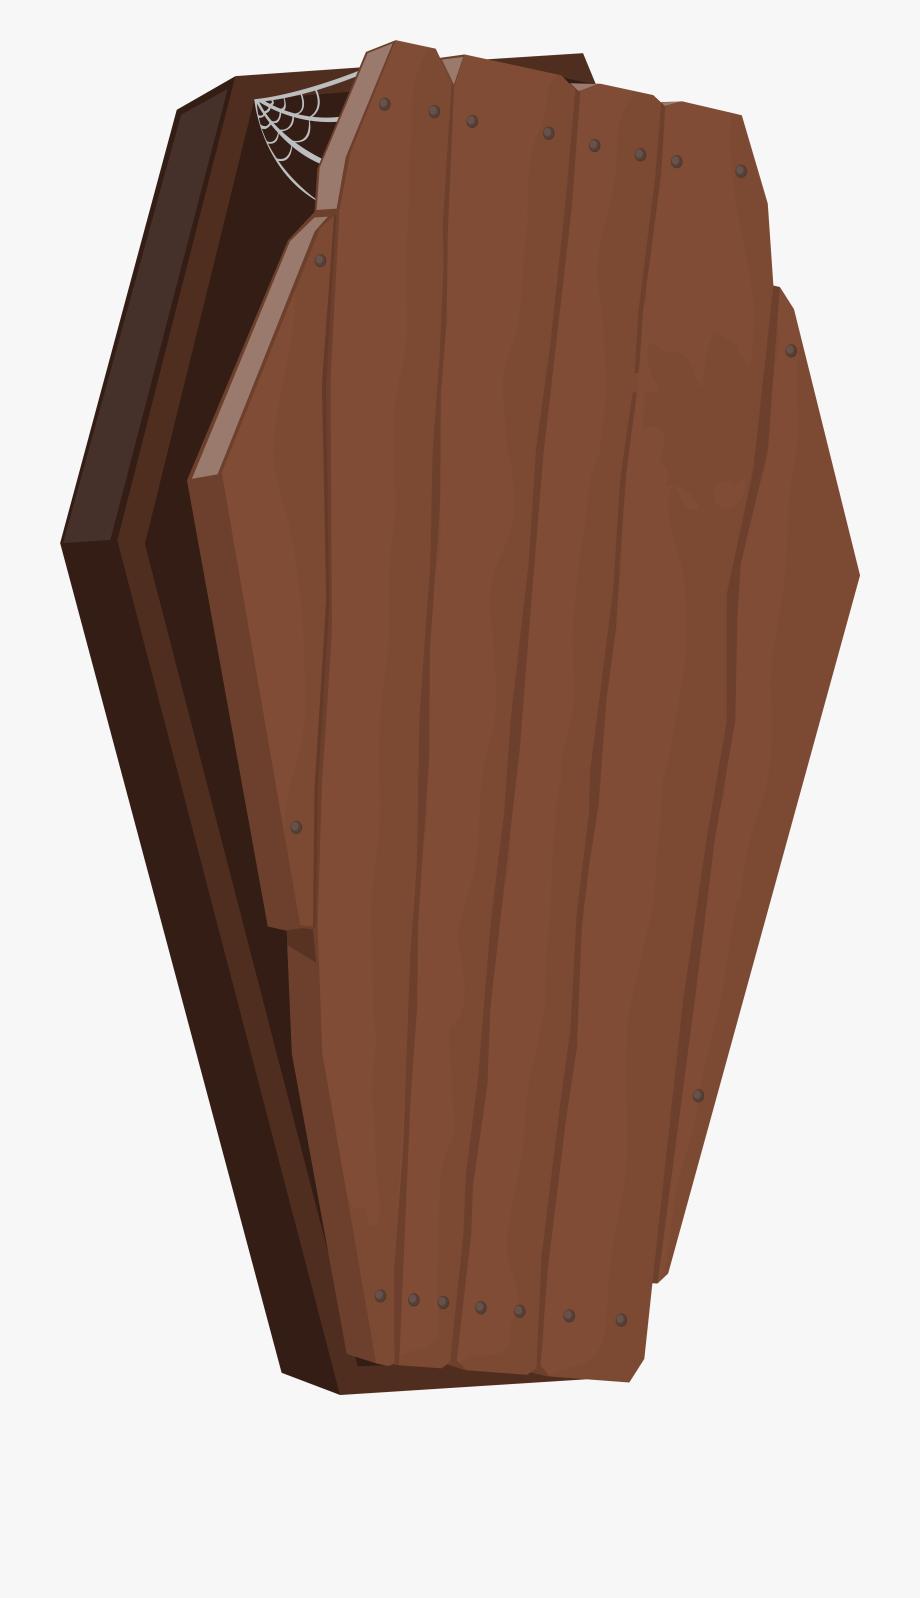 Transparent Coffin Halloween.